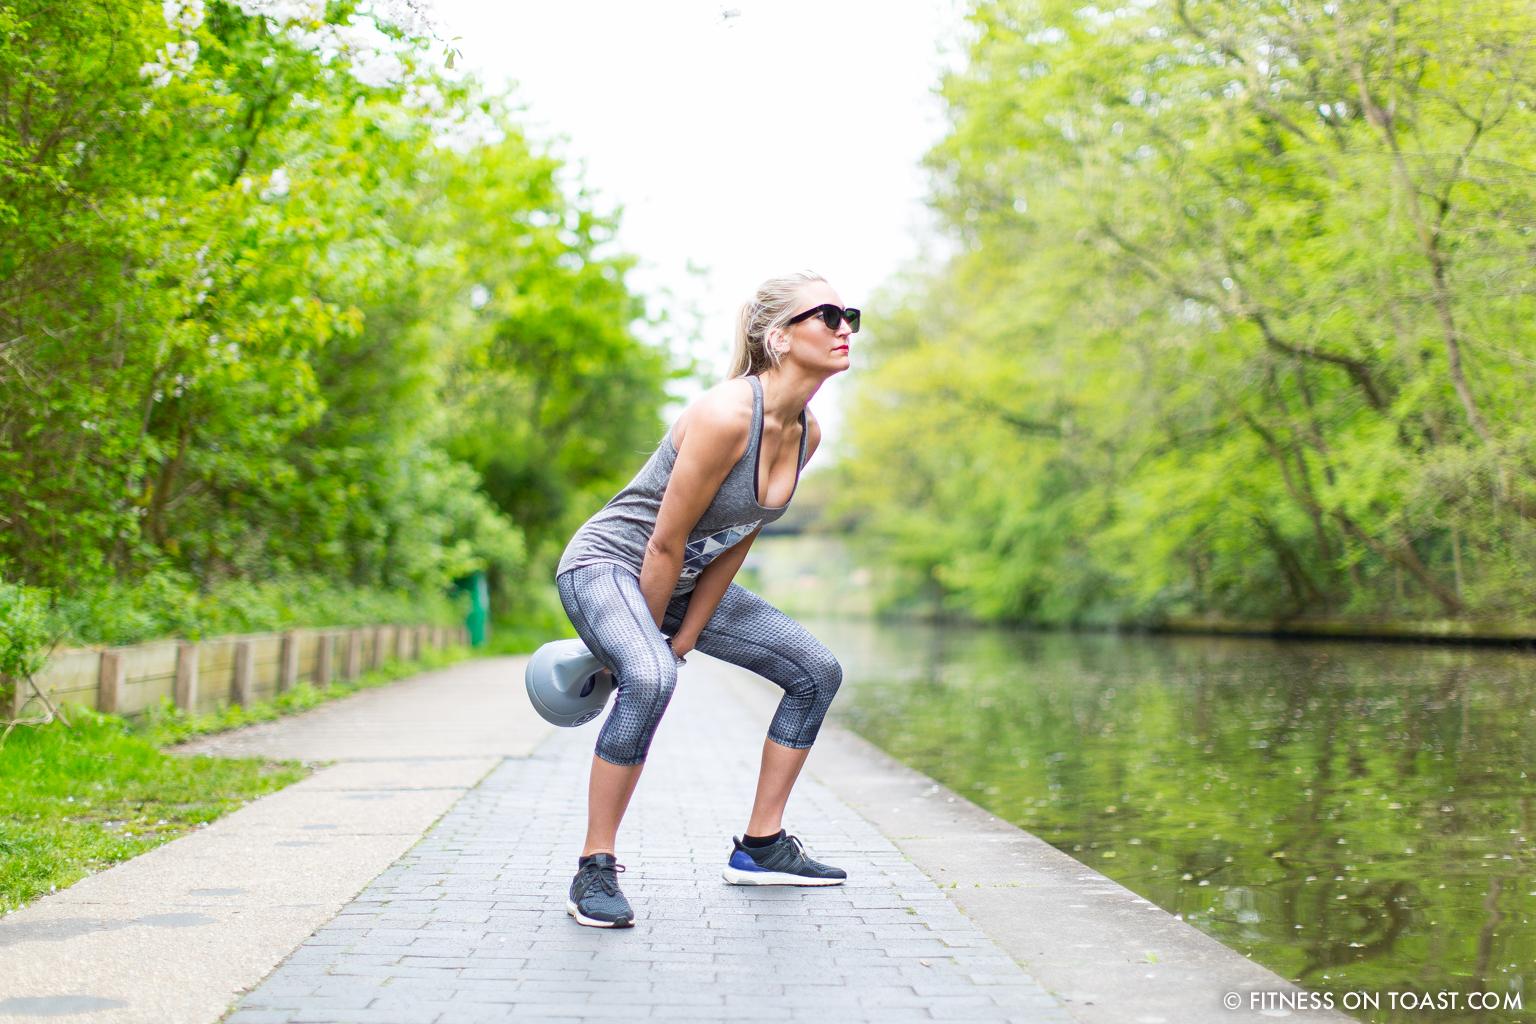 Fitness On Toast Faya Blog Girl Healthy Workout Regents Canal London Kettle Bell Squat Swing Lunge Twist Burpees Old Navy Fashion OOTD Gap Chanel Celine-5